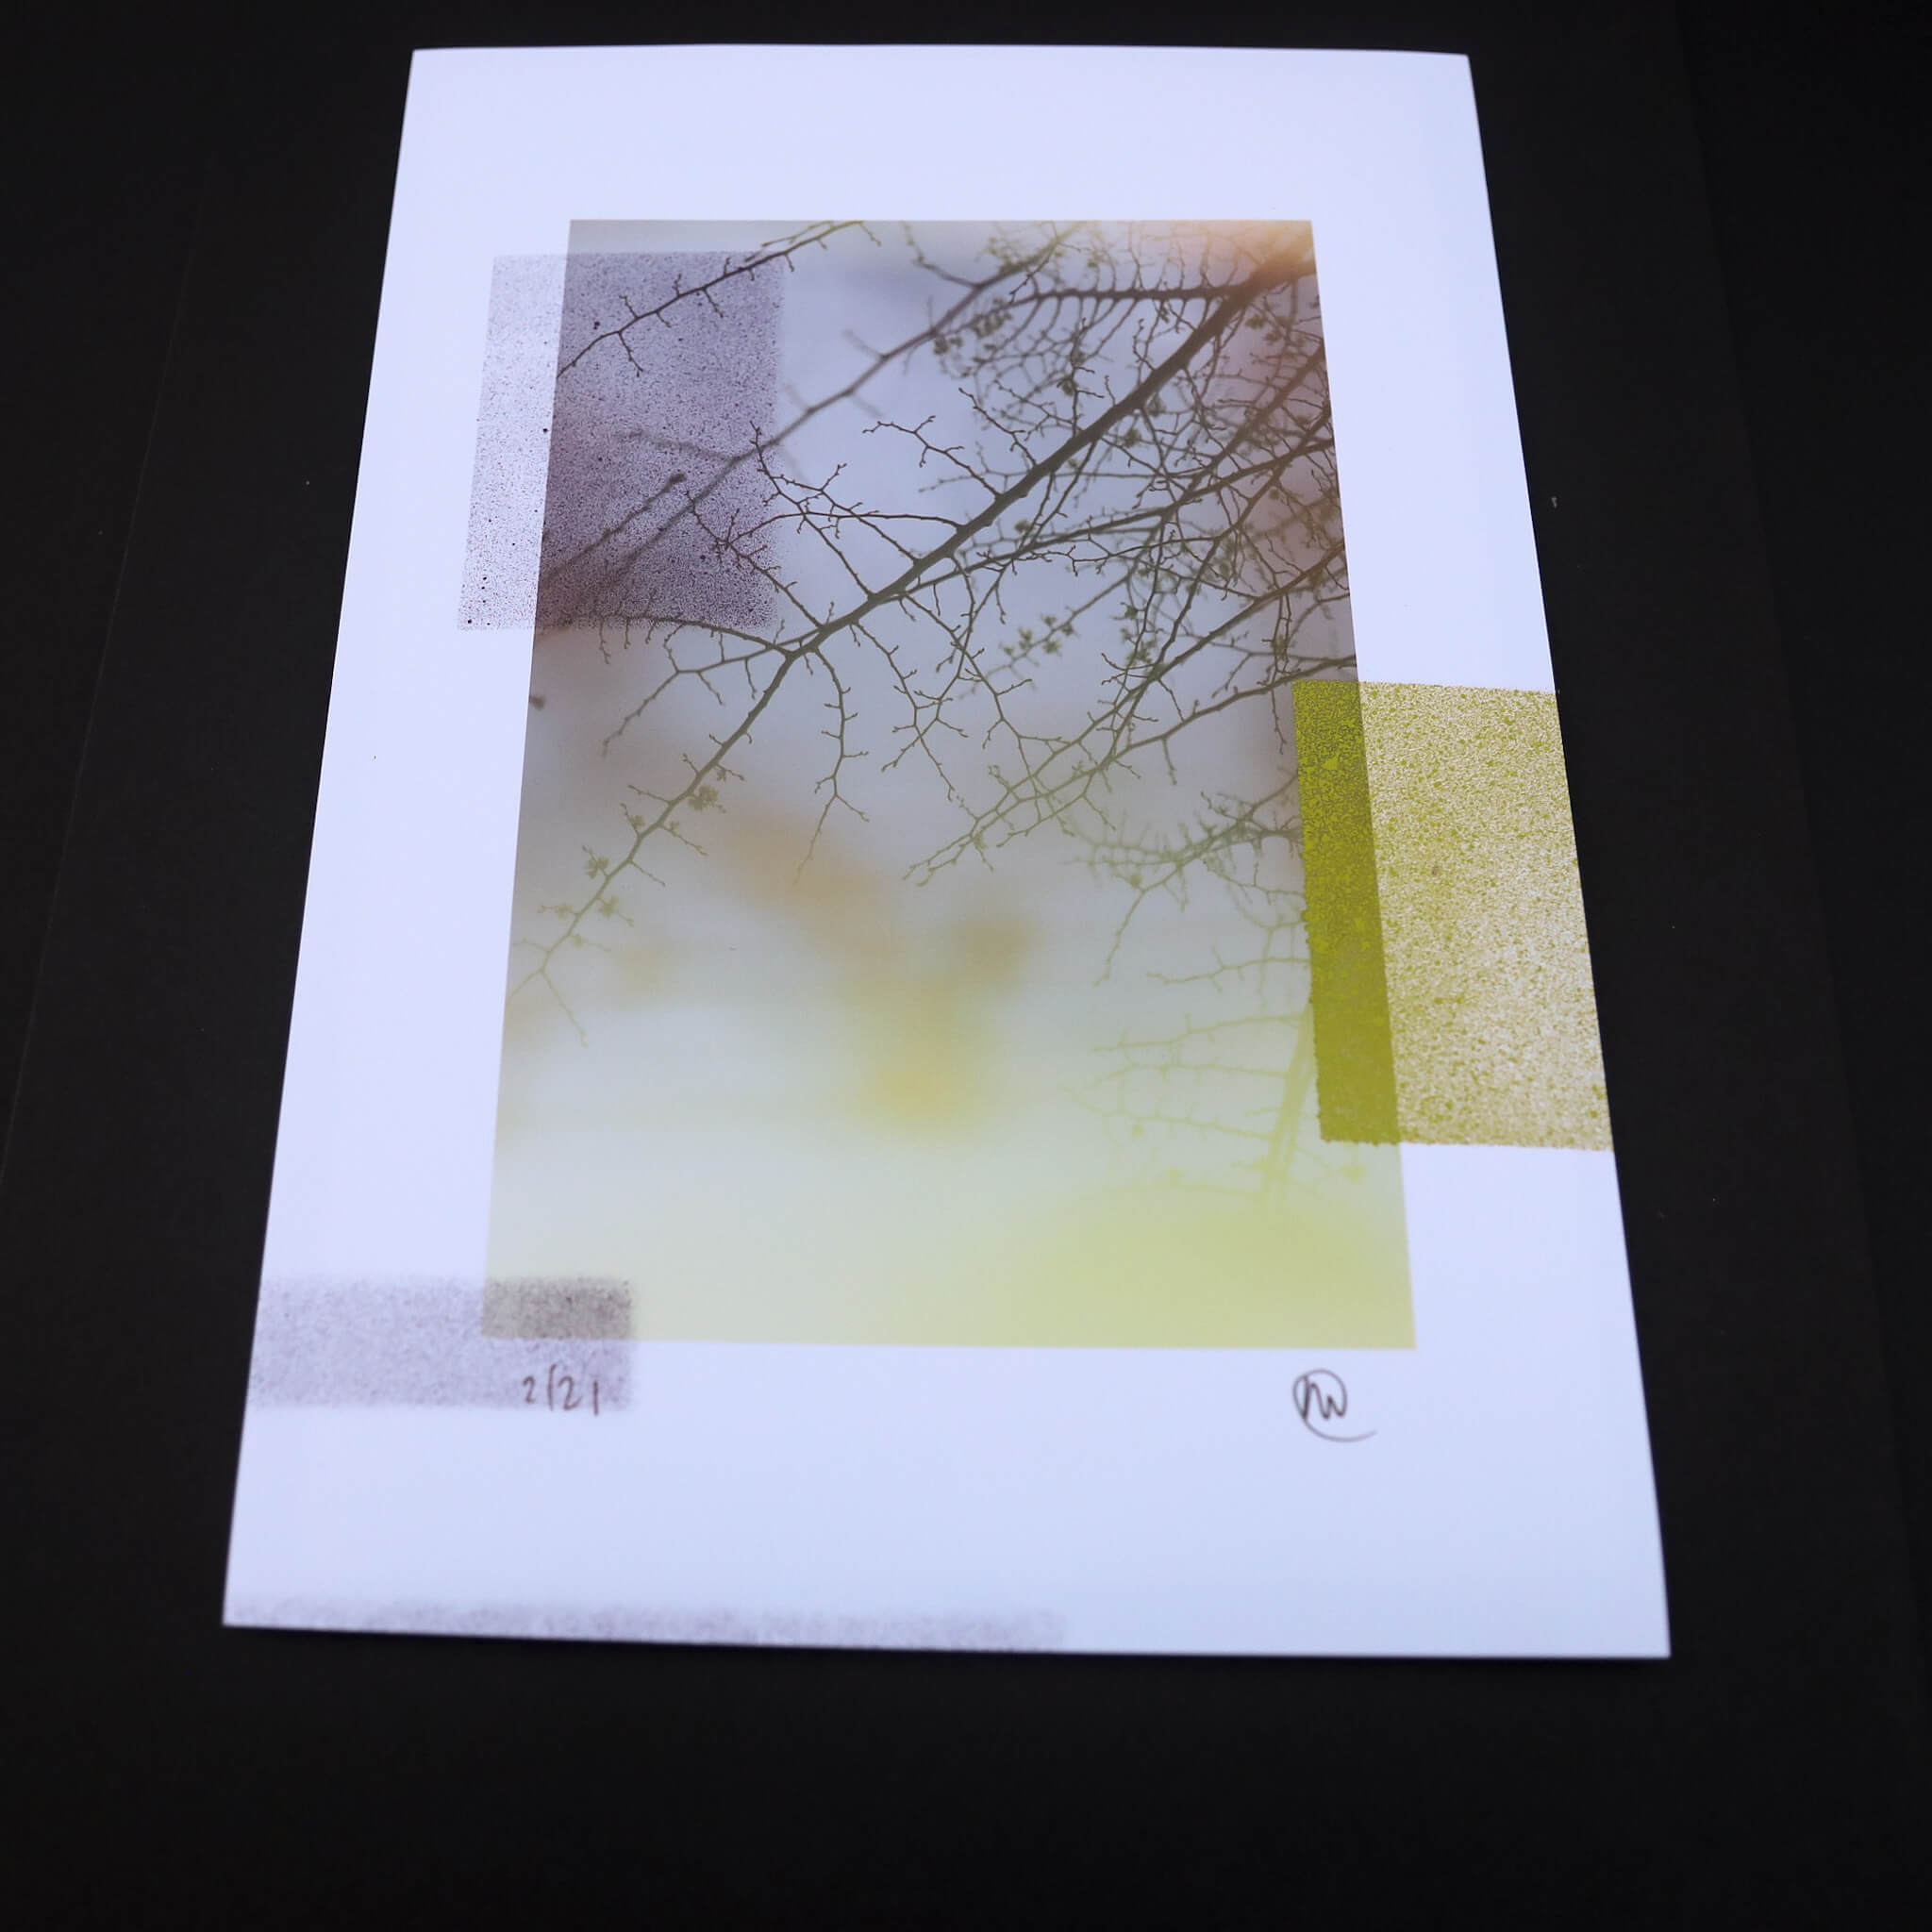 N58A0489 - Camberwell Untitled by Adrian Flower